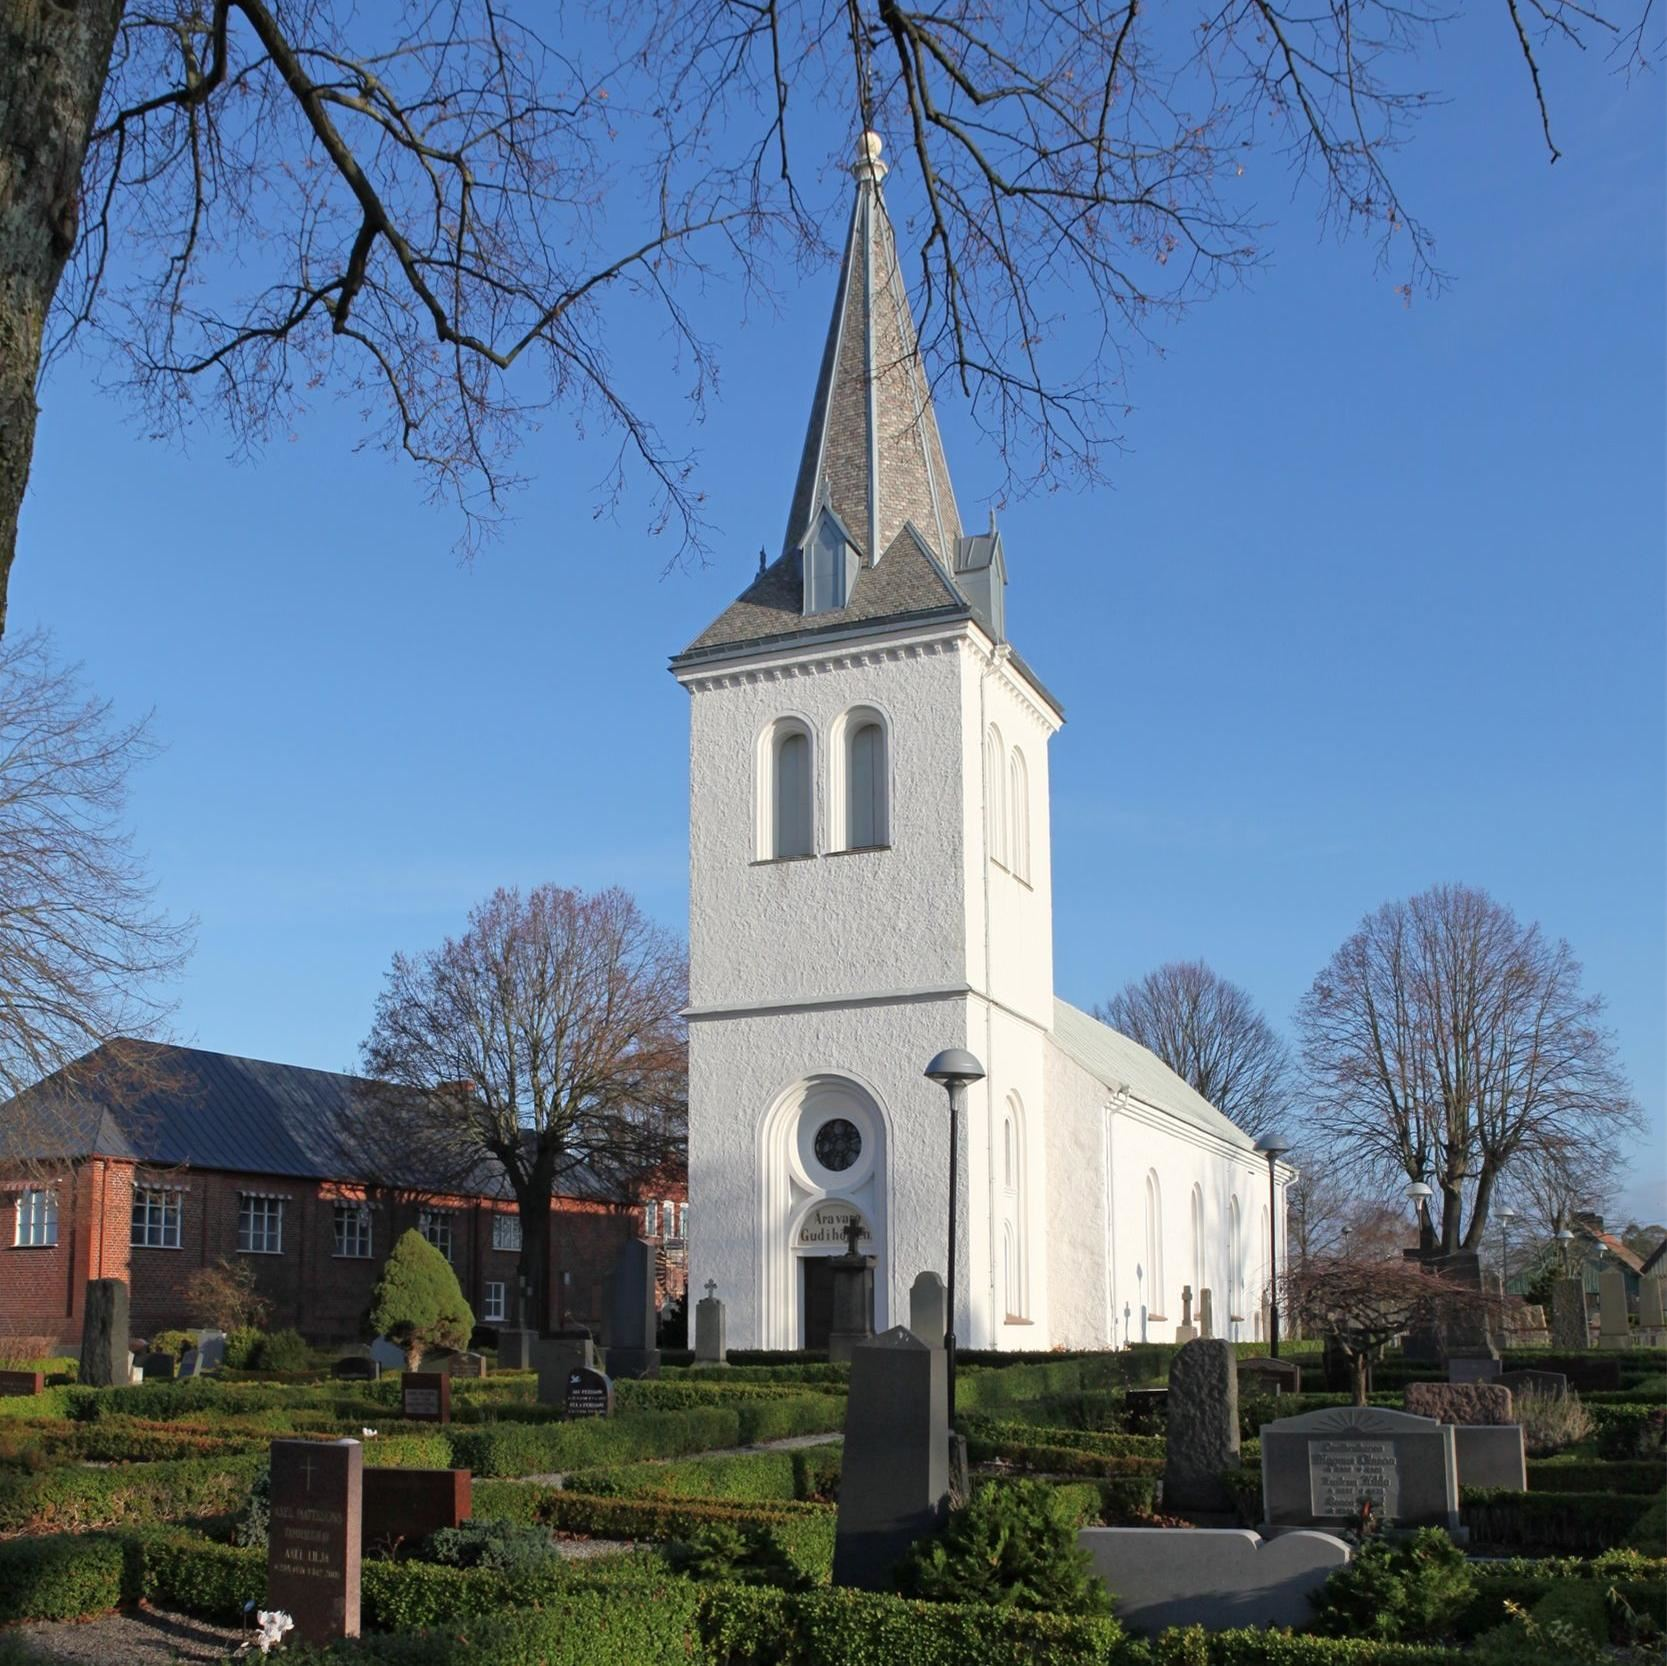 Lackalänga church